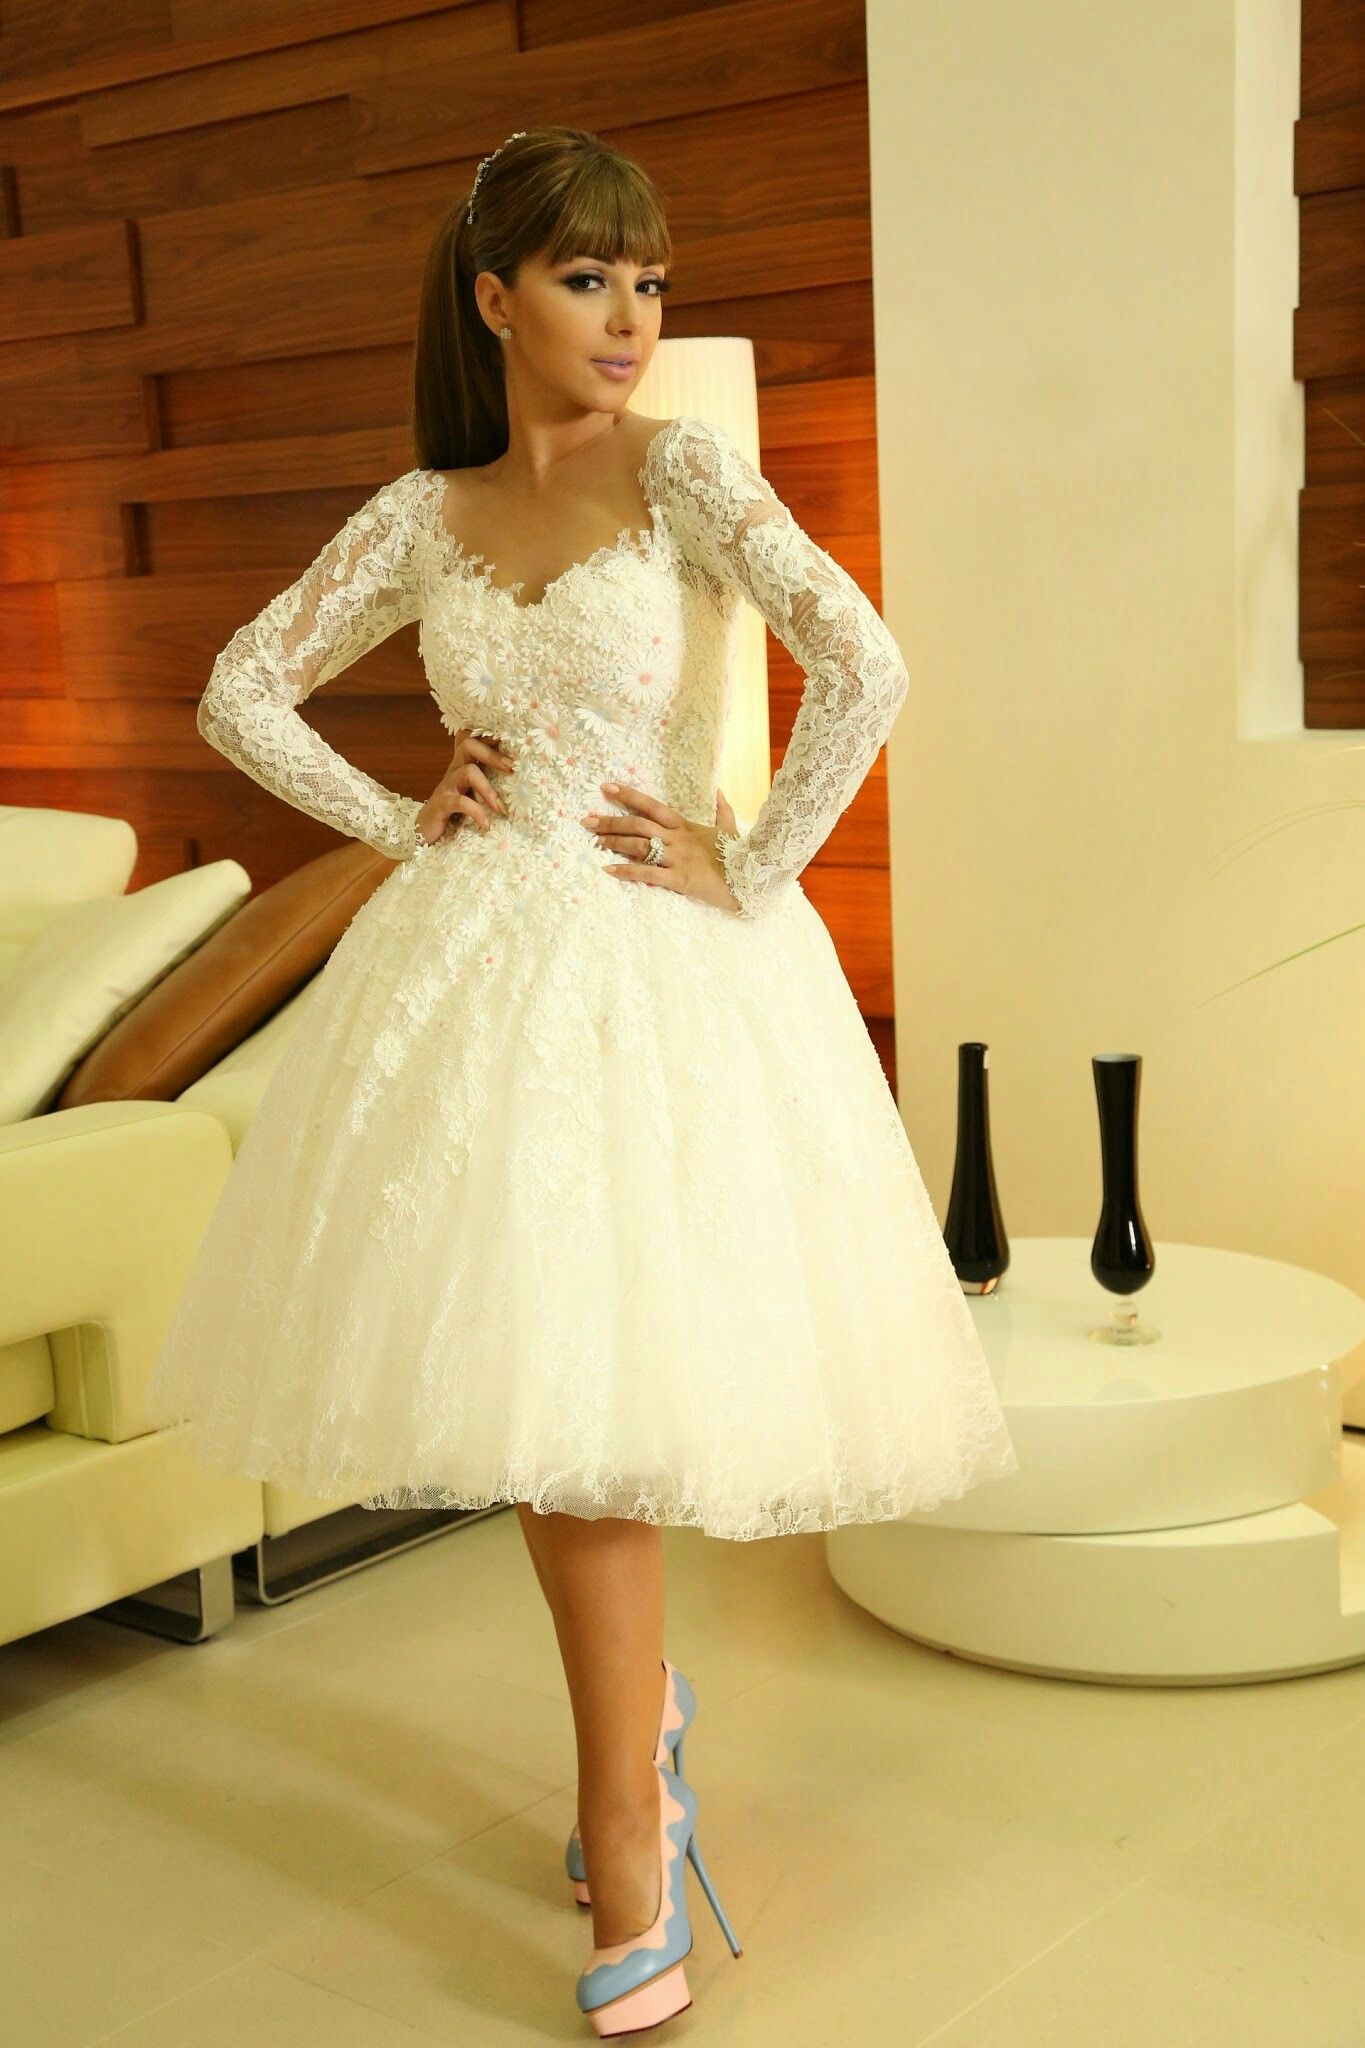 Mini wedding dresses  Pin by rania banna on Hot Mini Dress  Pinterest  Mini dresses and